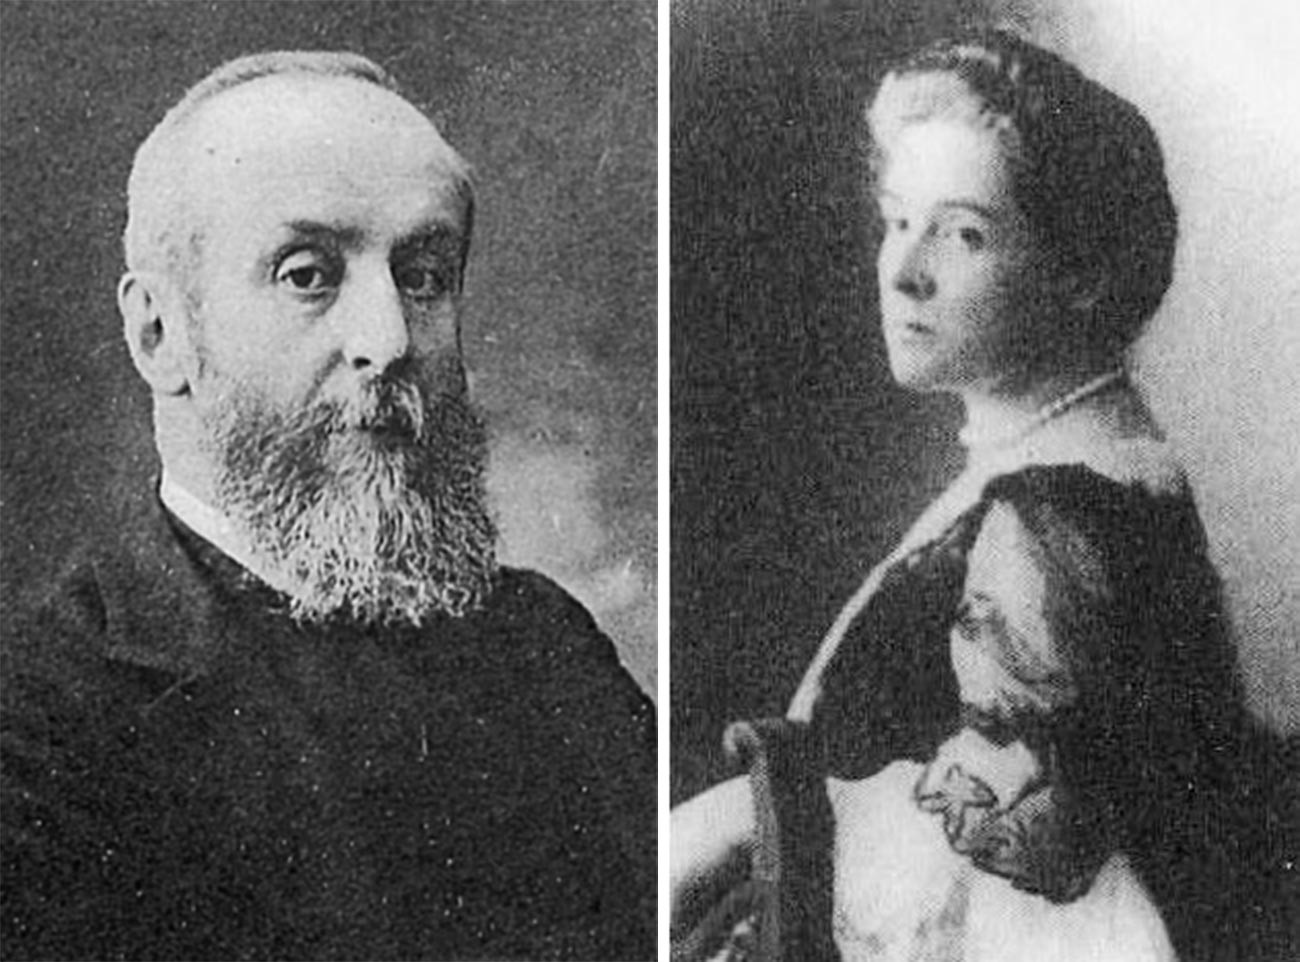 Alexánder Bobrinski y Nadezhda Bobrínskaia, los padres de Sofía